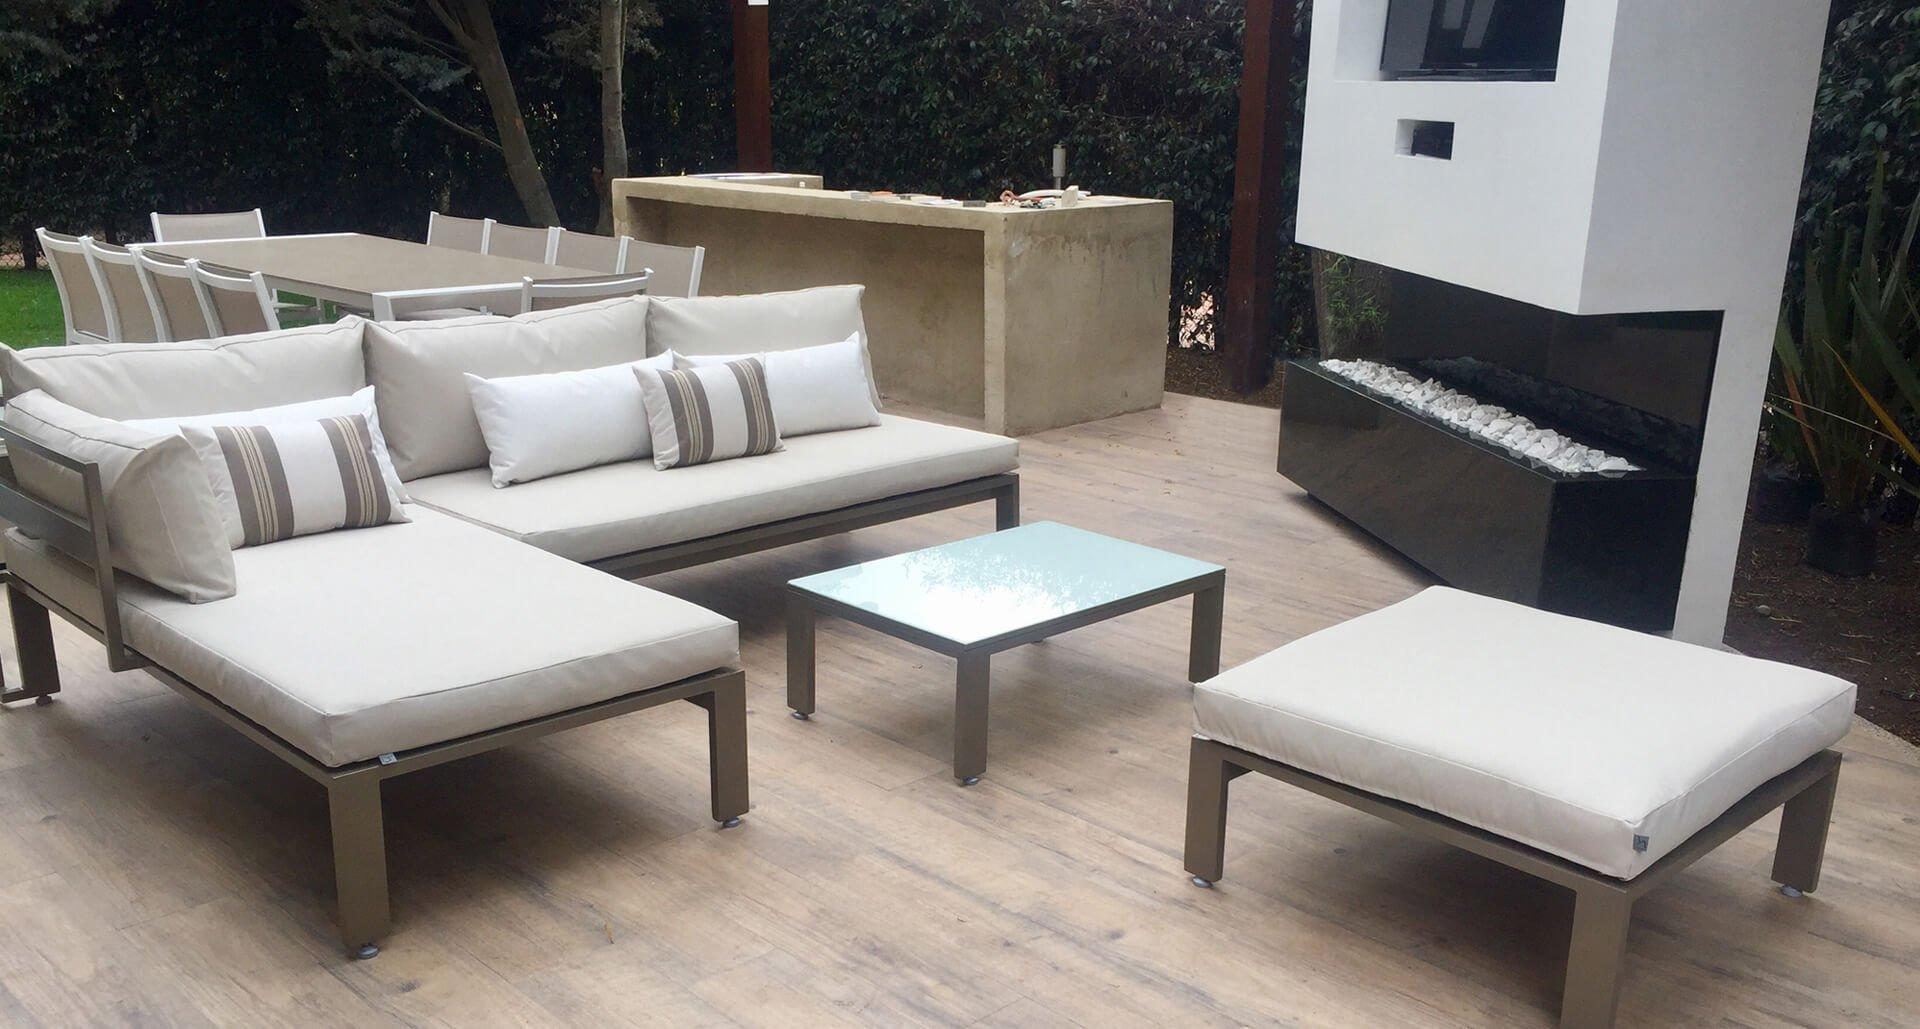 Muebles para exteriores curvar - Muebles para exteriores ...